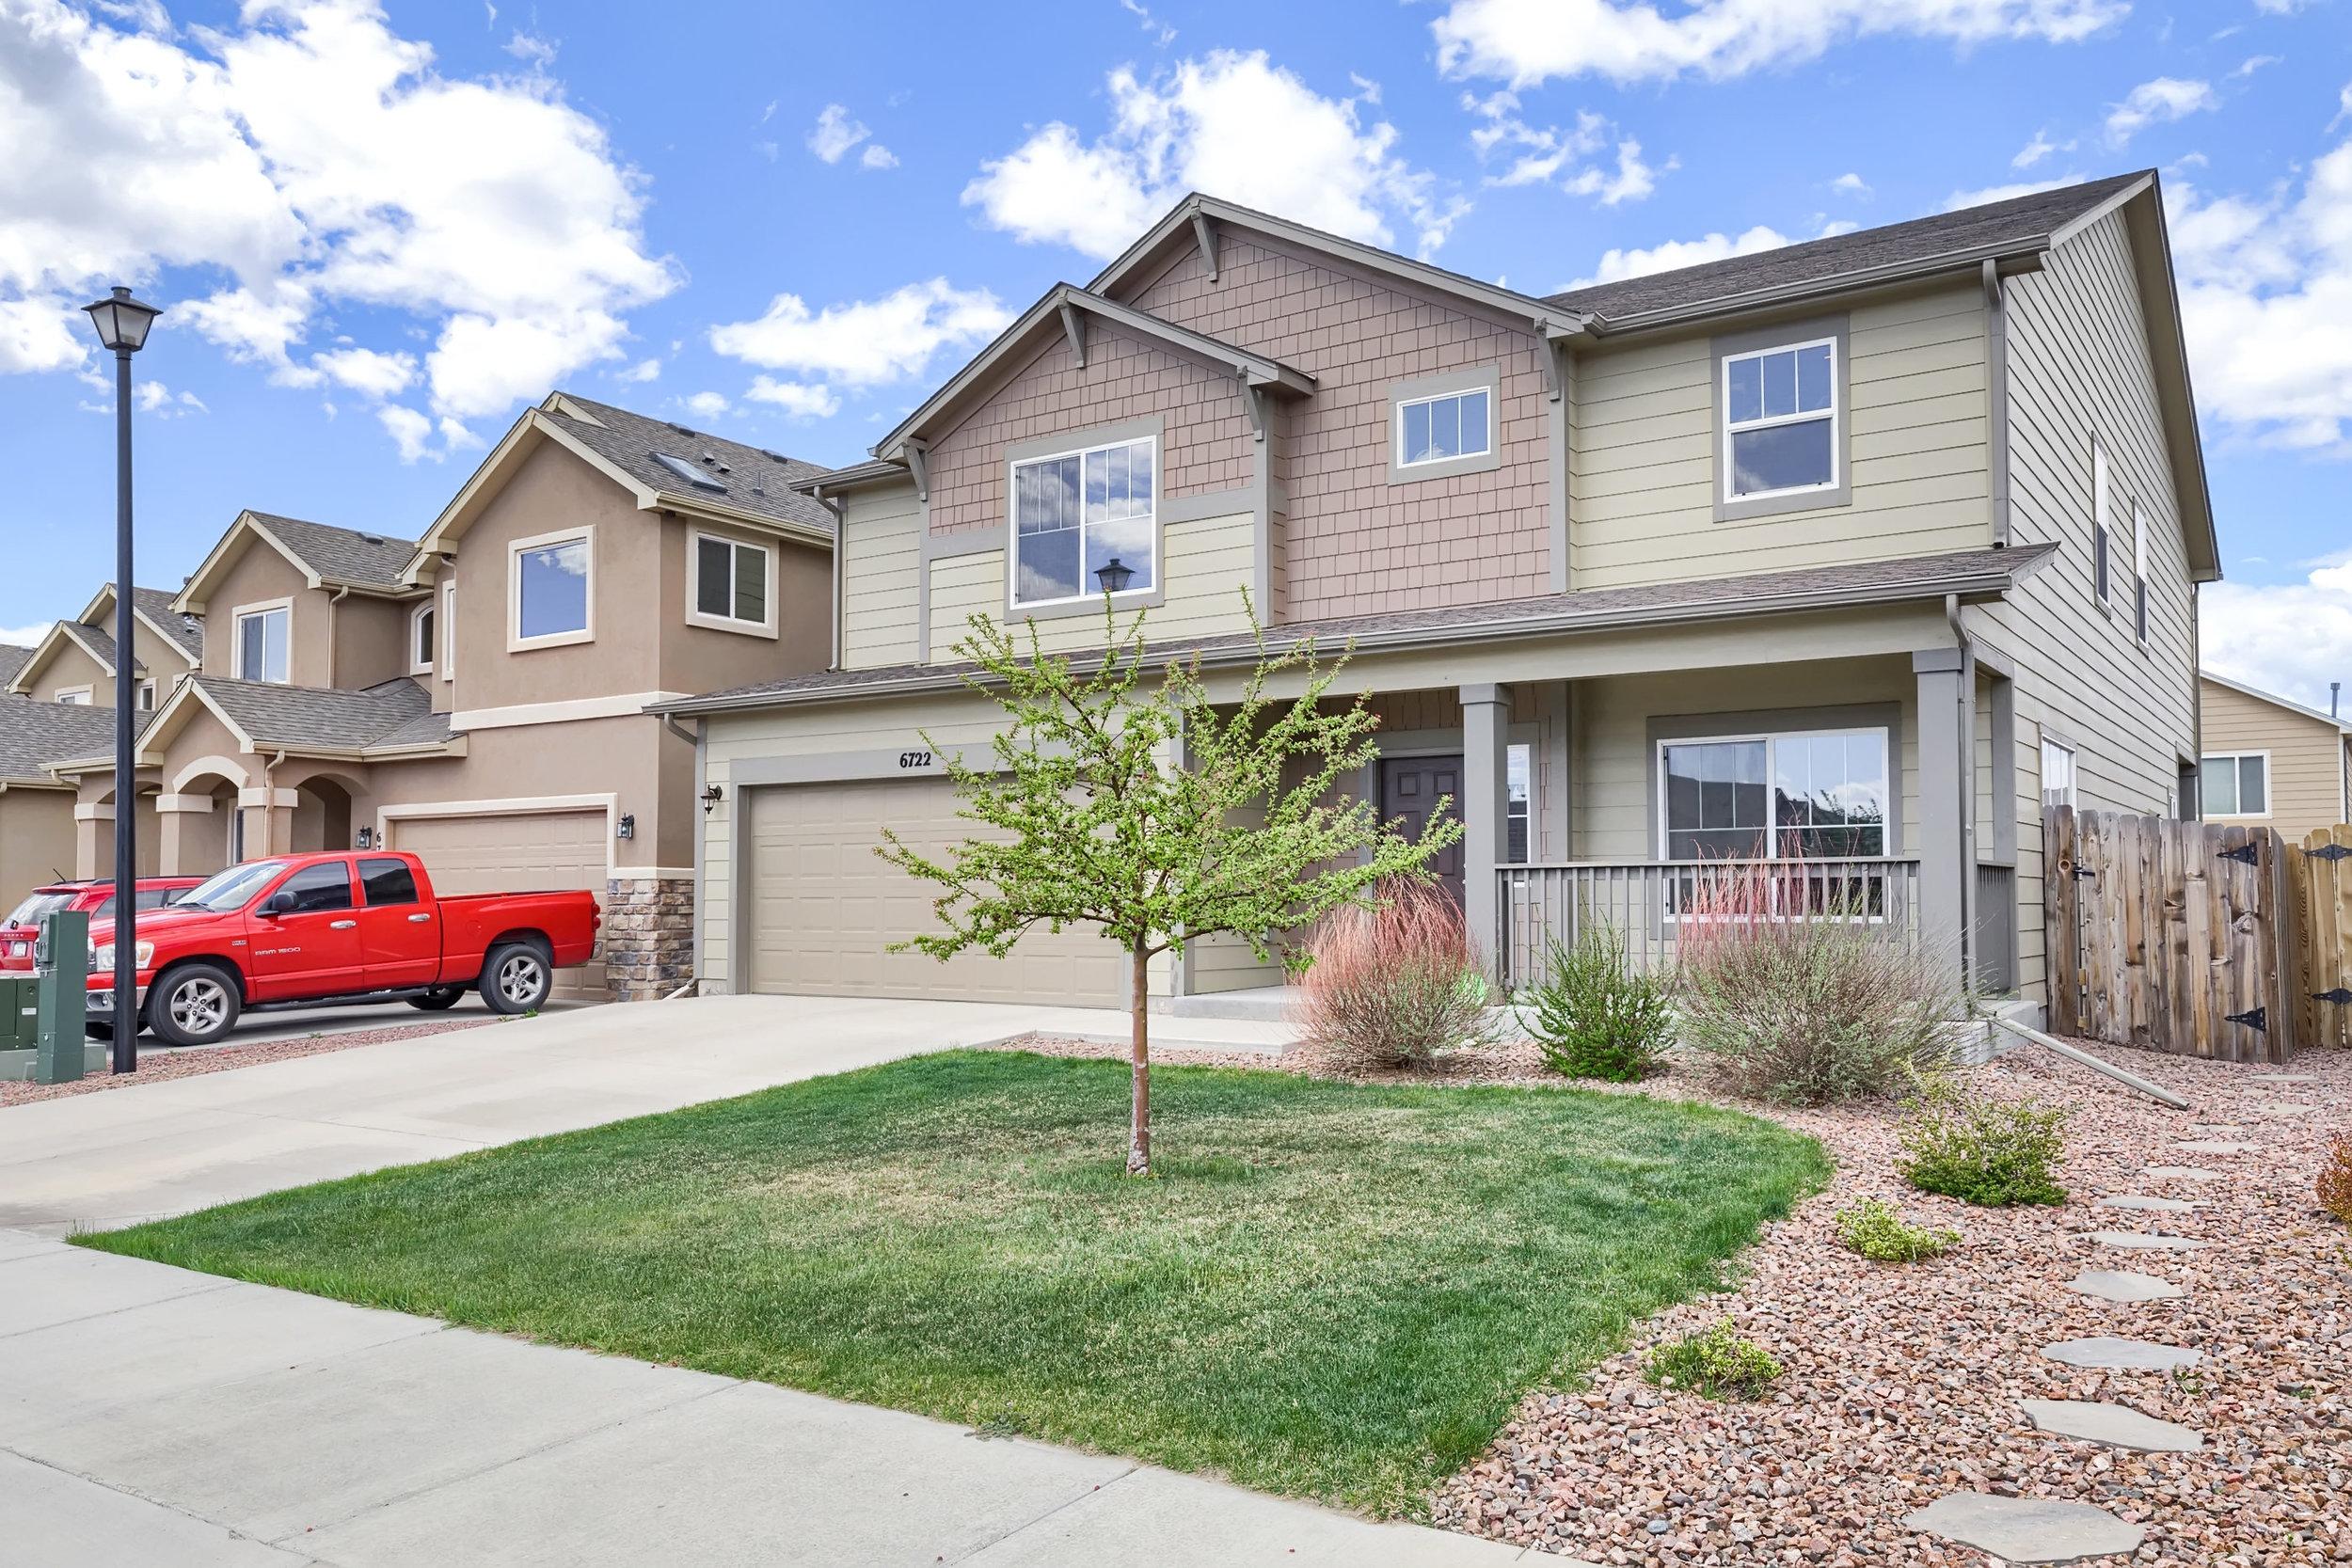 6722 Stingray Lane Colorado-print-001-37-Exterior Front-2800x1867-300dpi.jpg